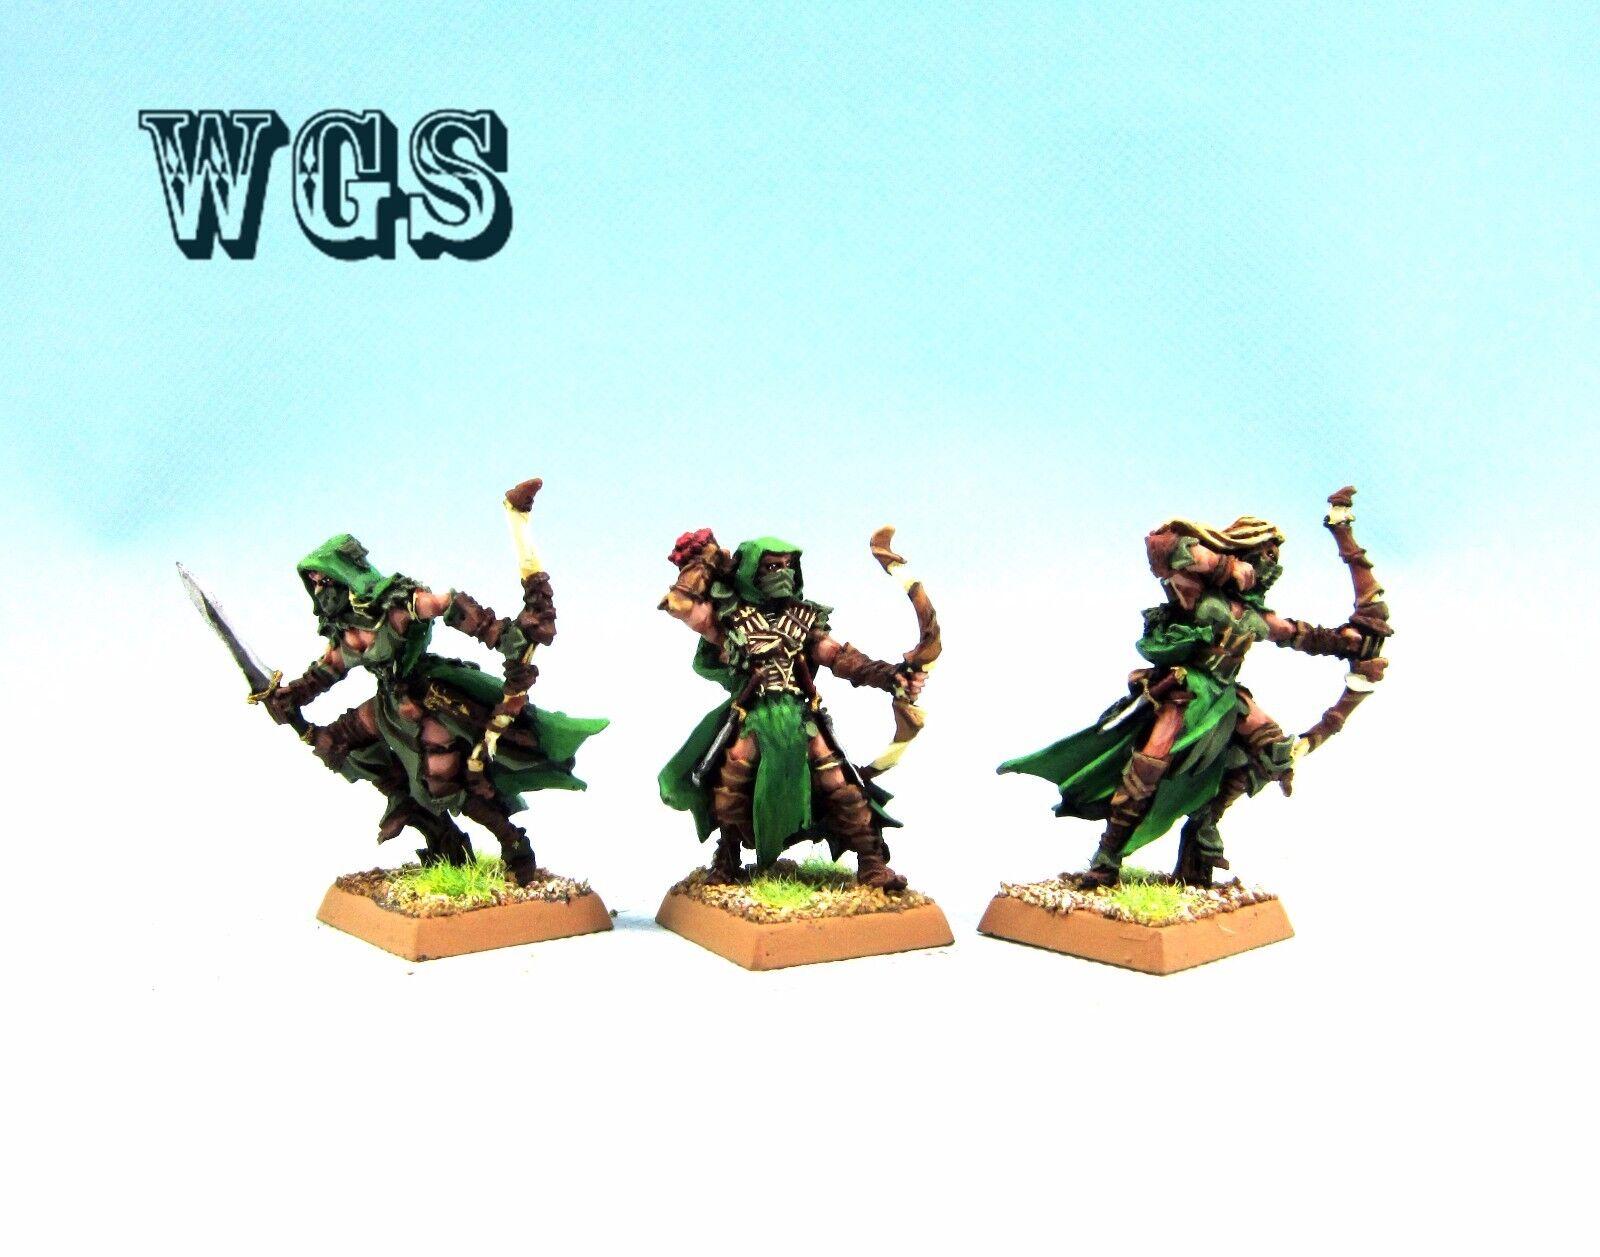 25mm Warhammer Fantasy WGS Painted Painted Painted Wood Elf Waywatchers WE009 2cc300